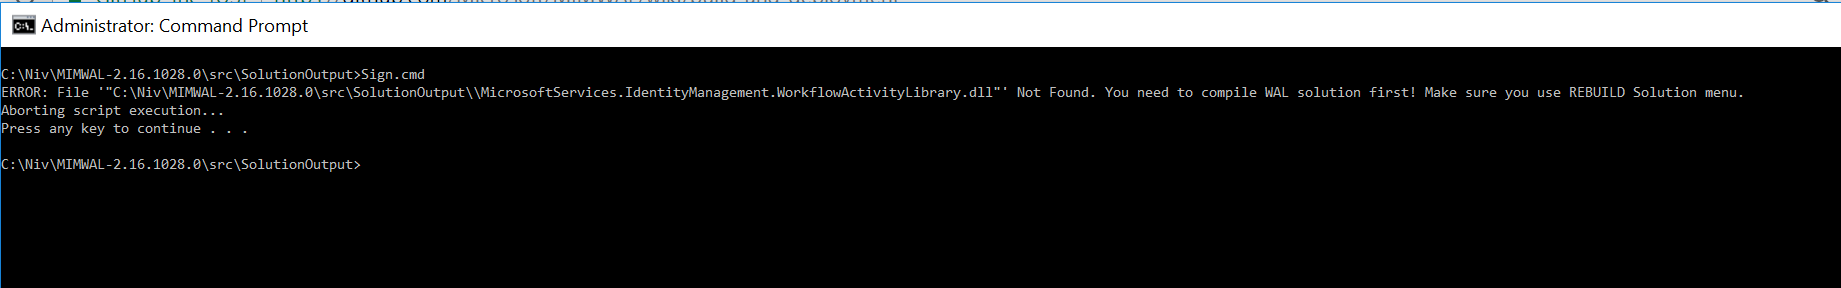 Error rebuilding MIMWAL - File MicrosoftServices